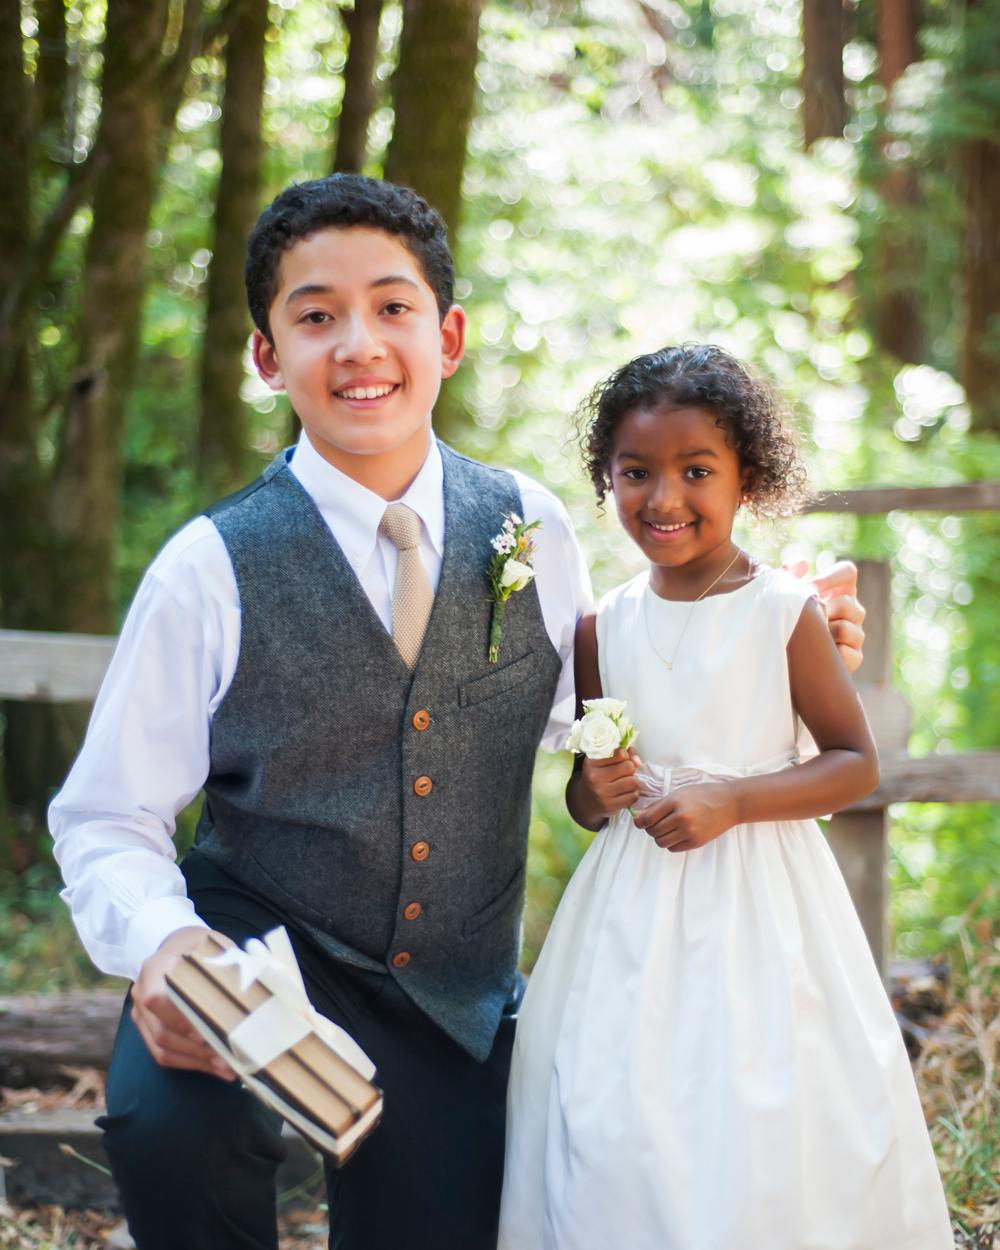 ralston-white-retreat-mill-valley-wedding-photography-lilouette-37.jpg